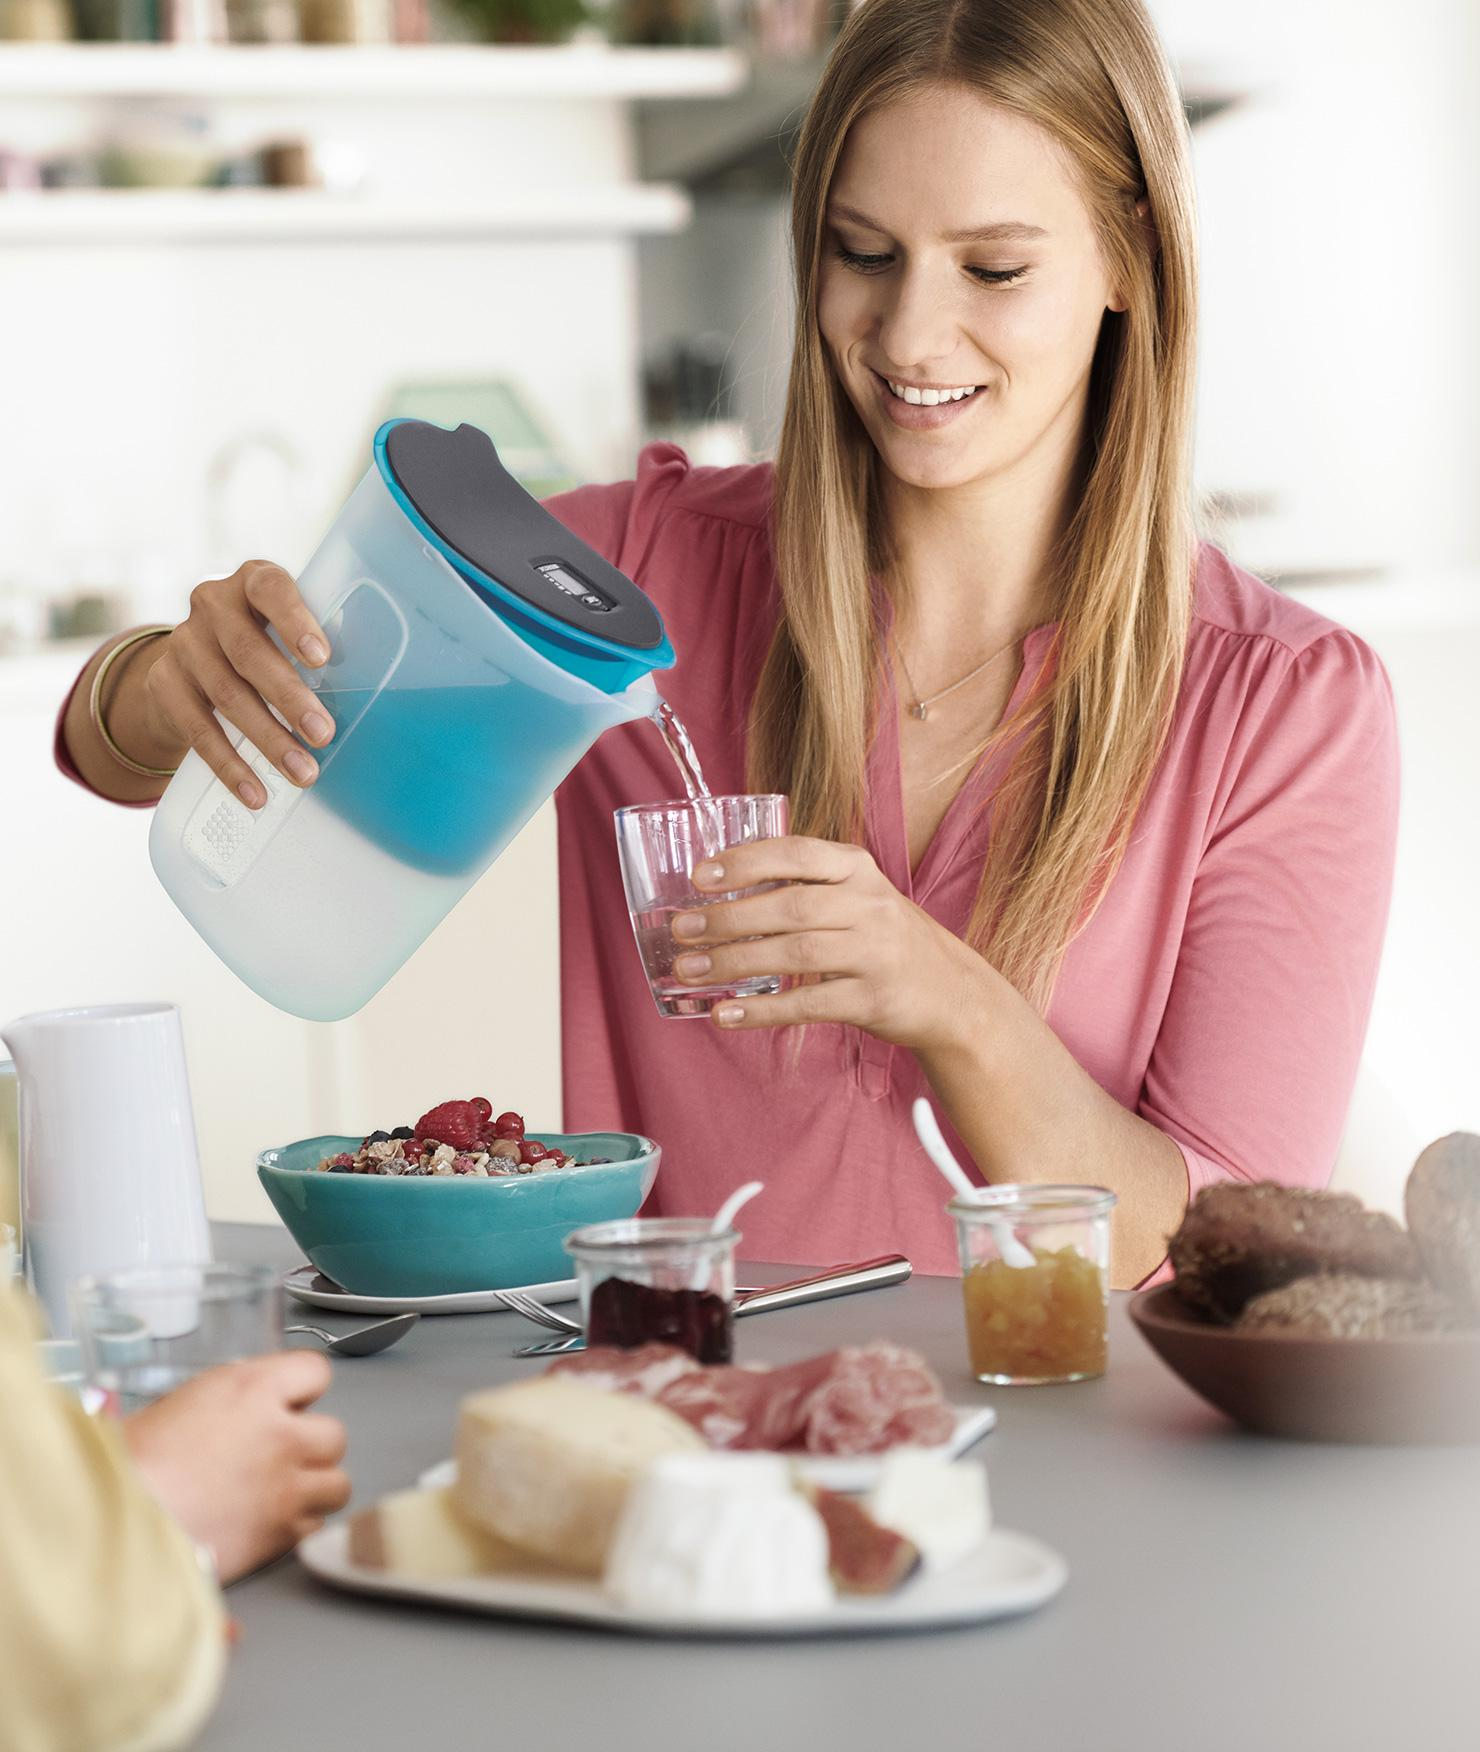 BRITA fill&enjoy Fun pink cuisine femme boisson